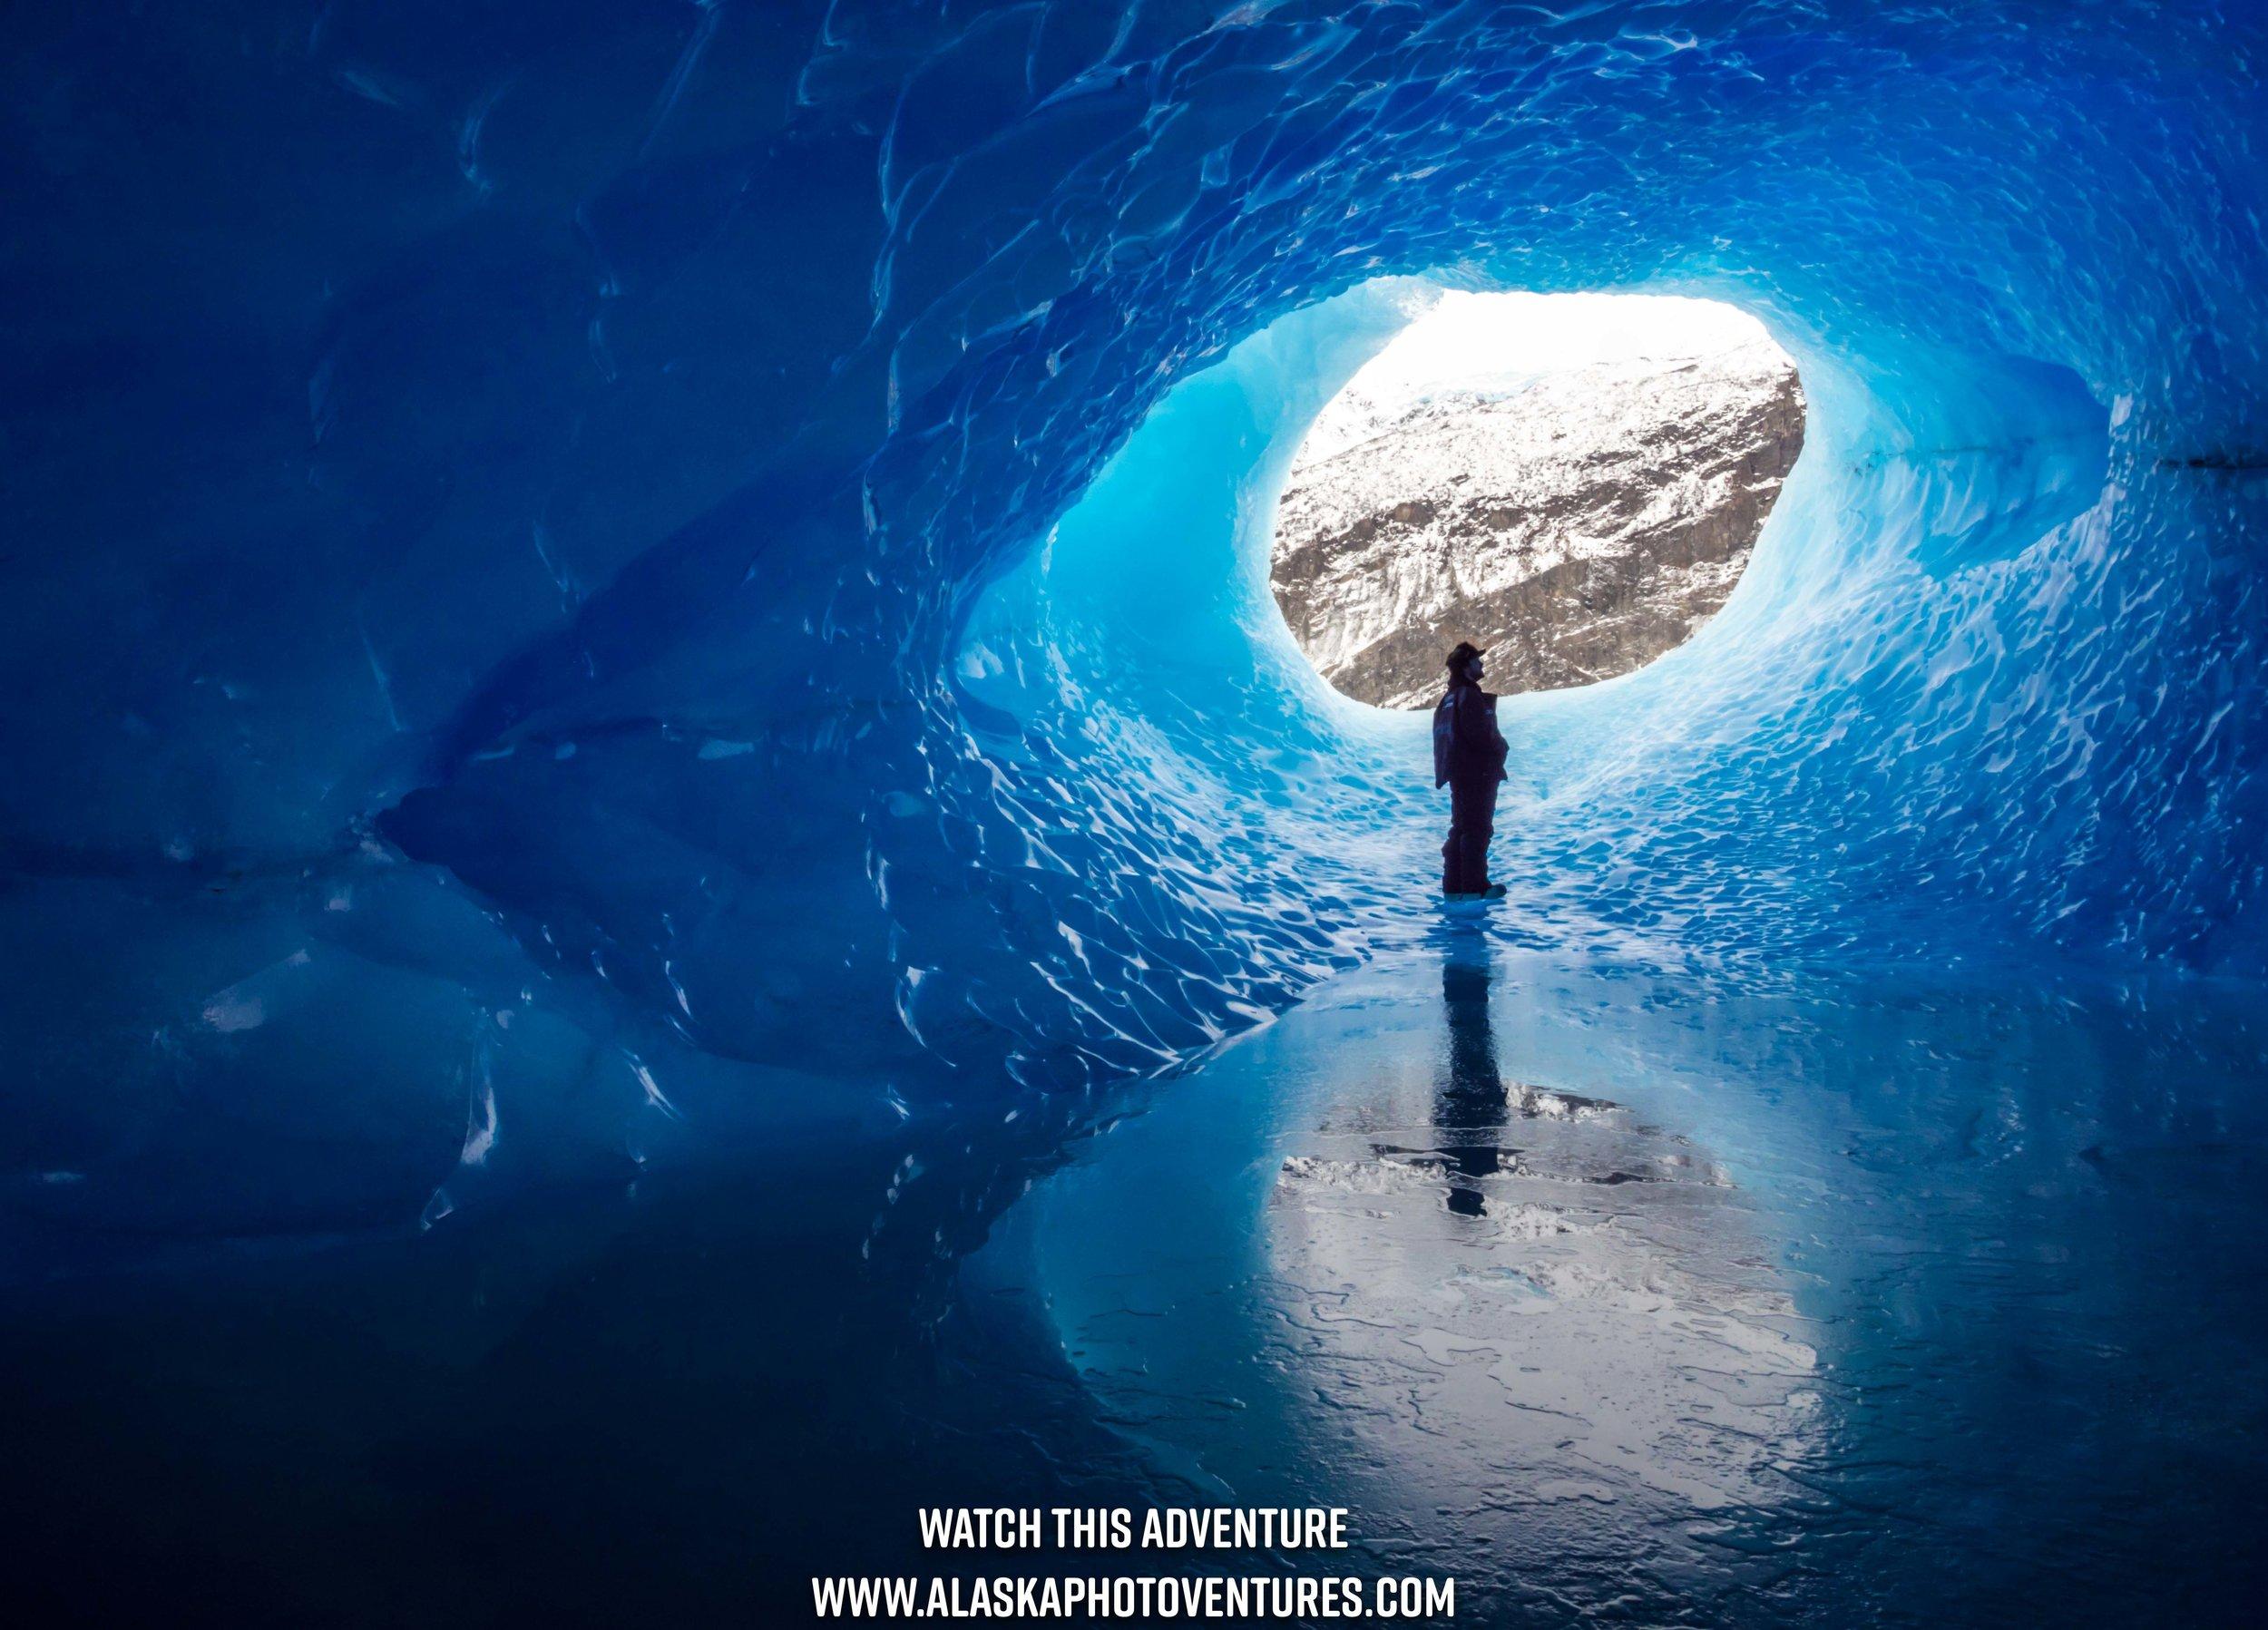 colony-glacier-adventure-photography-tv-show-alaska.jpg2.jpg